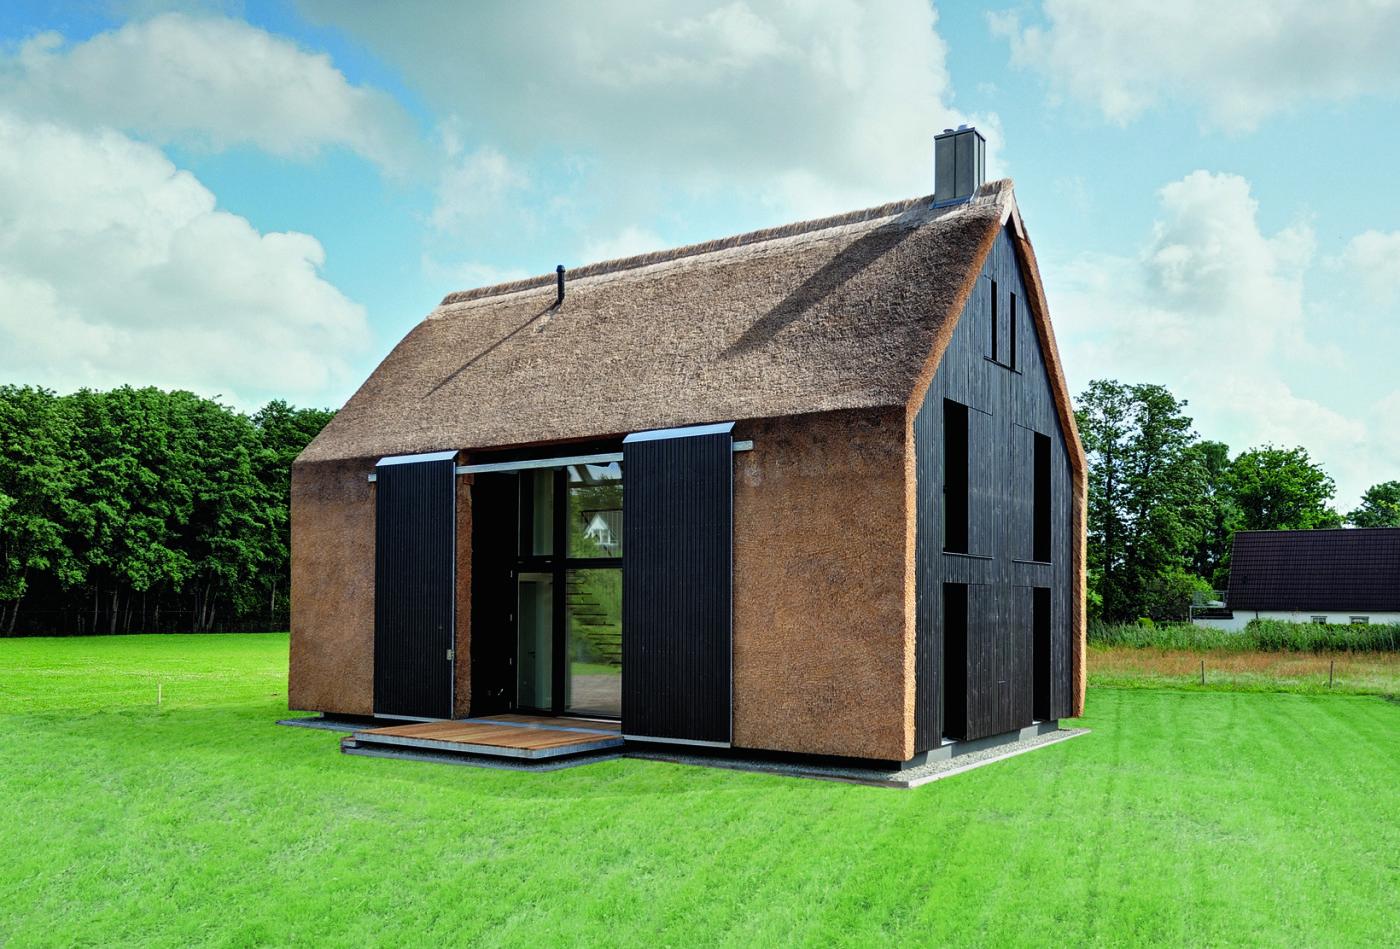 haus mit pelz reetdachhaus f r ferieng ste. Black Bedroom Furniture Sets. Home Design Ideas